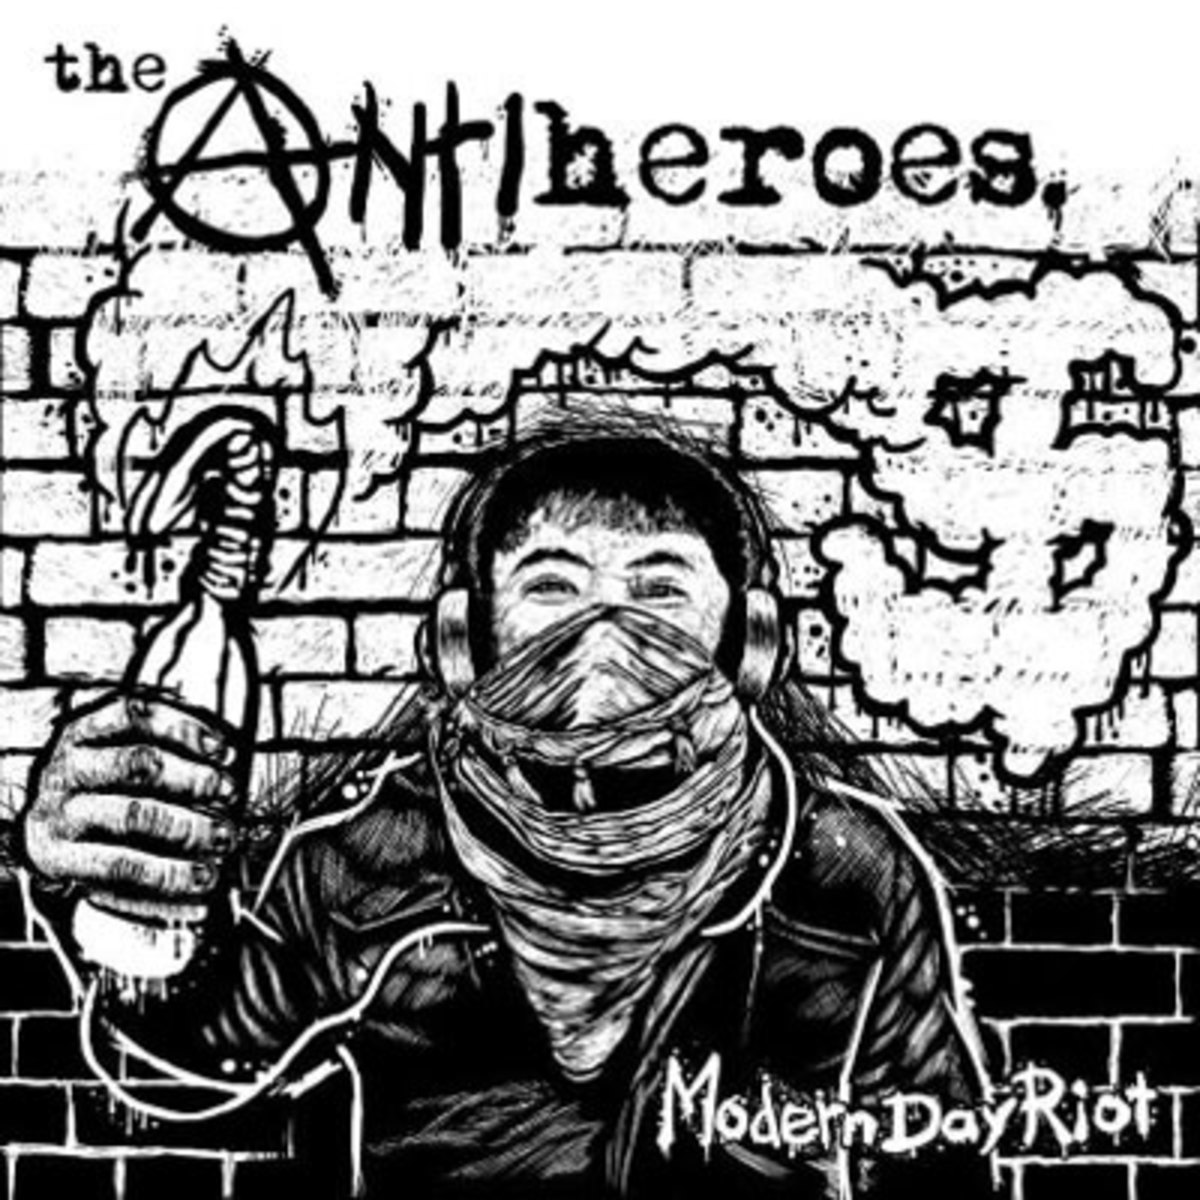 theantiheroes-moderndayriot.jpg